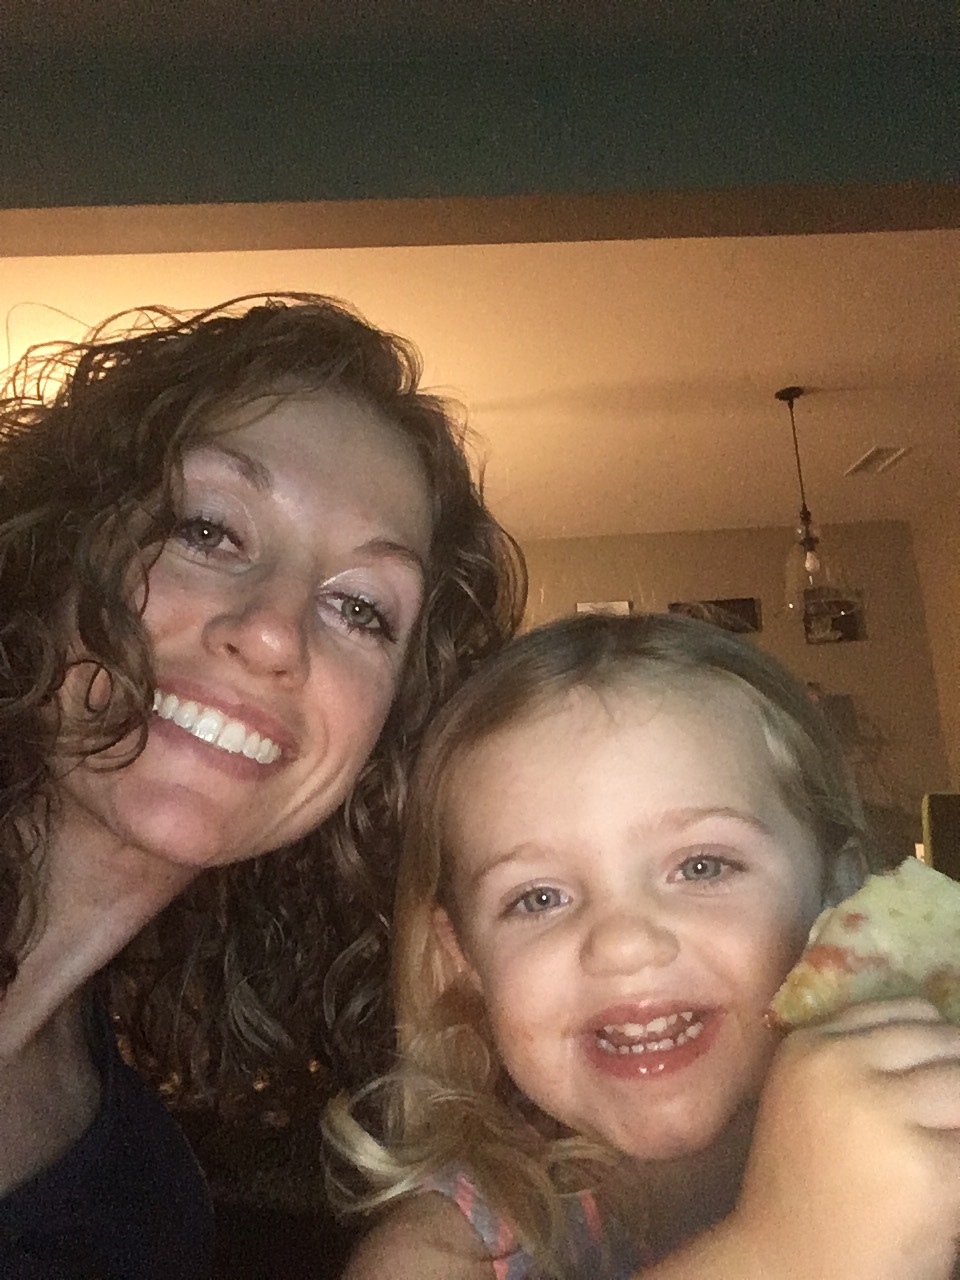 Pizza night selfie!